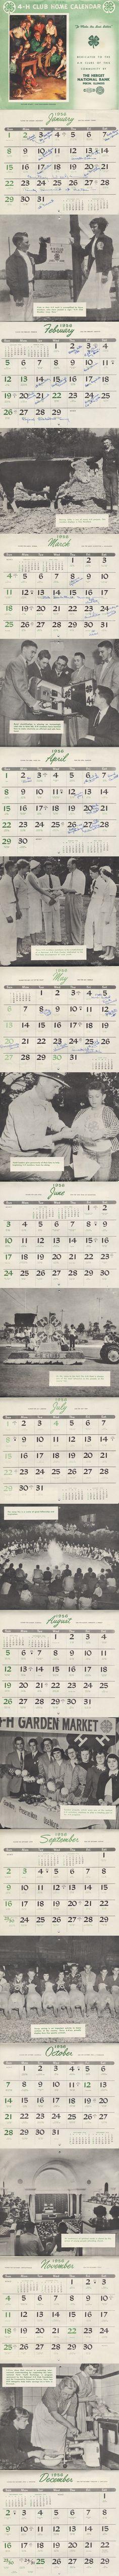 Full Historic 1952 4-H Calendar